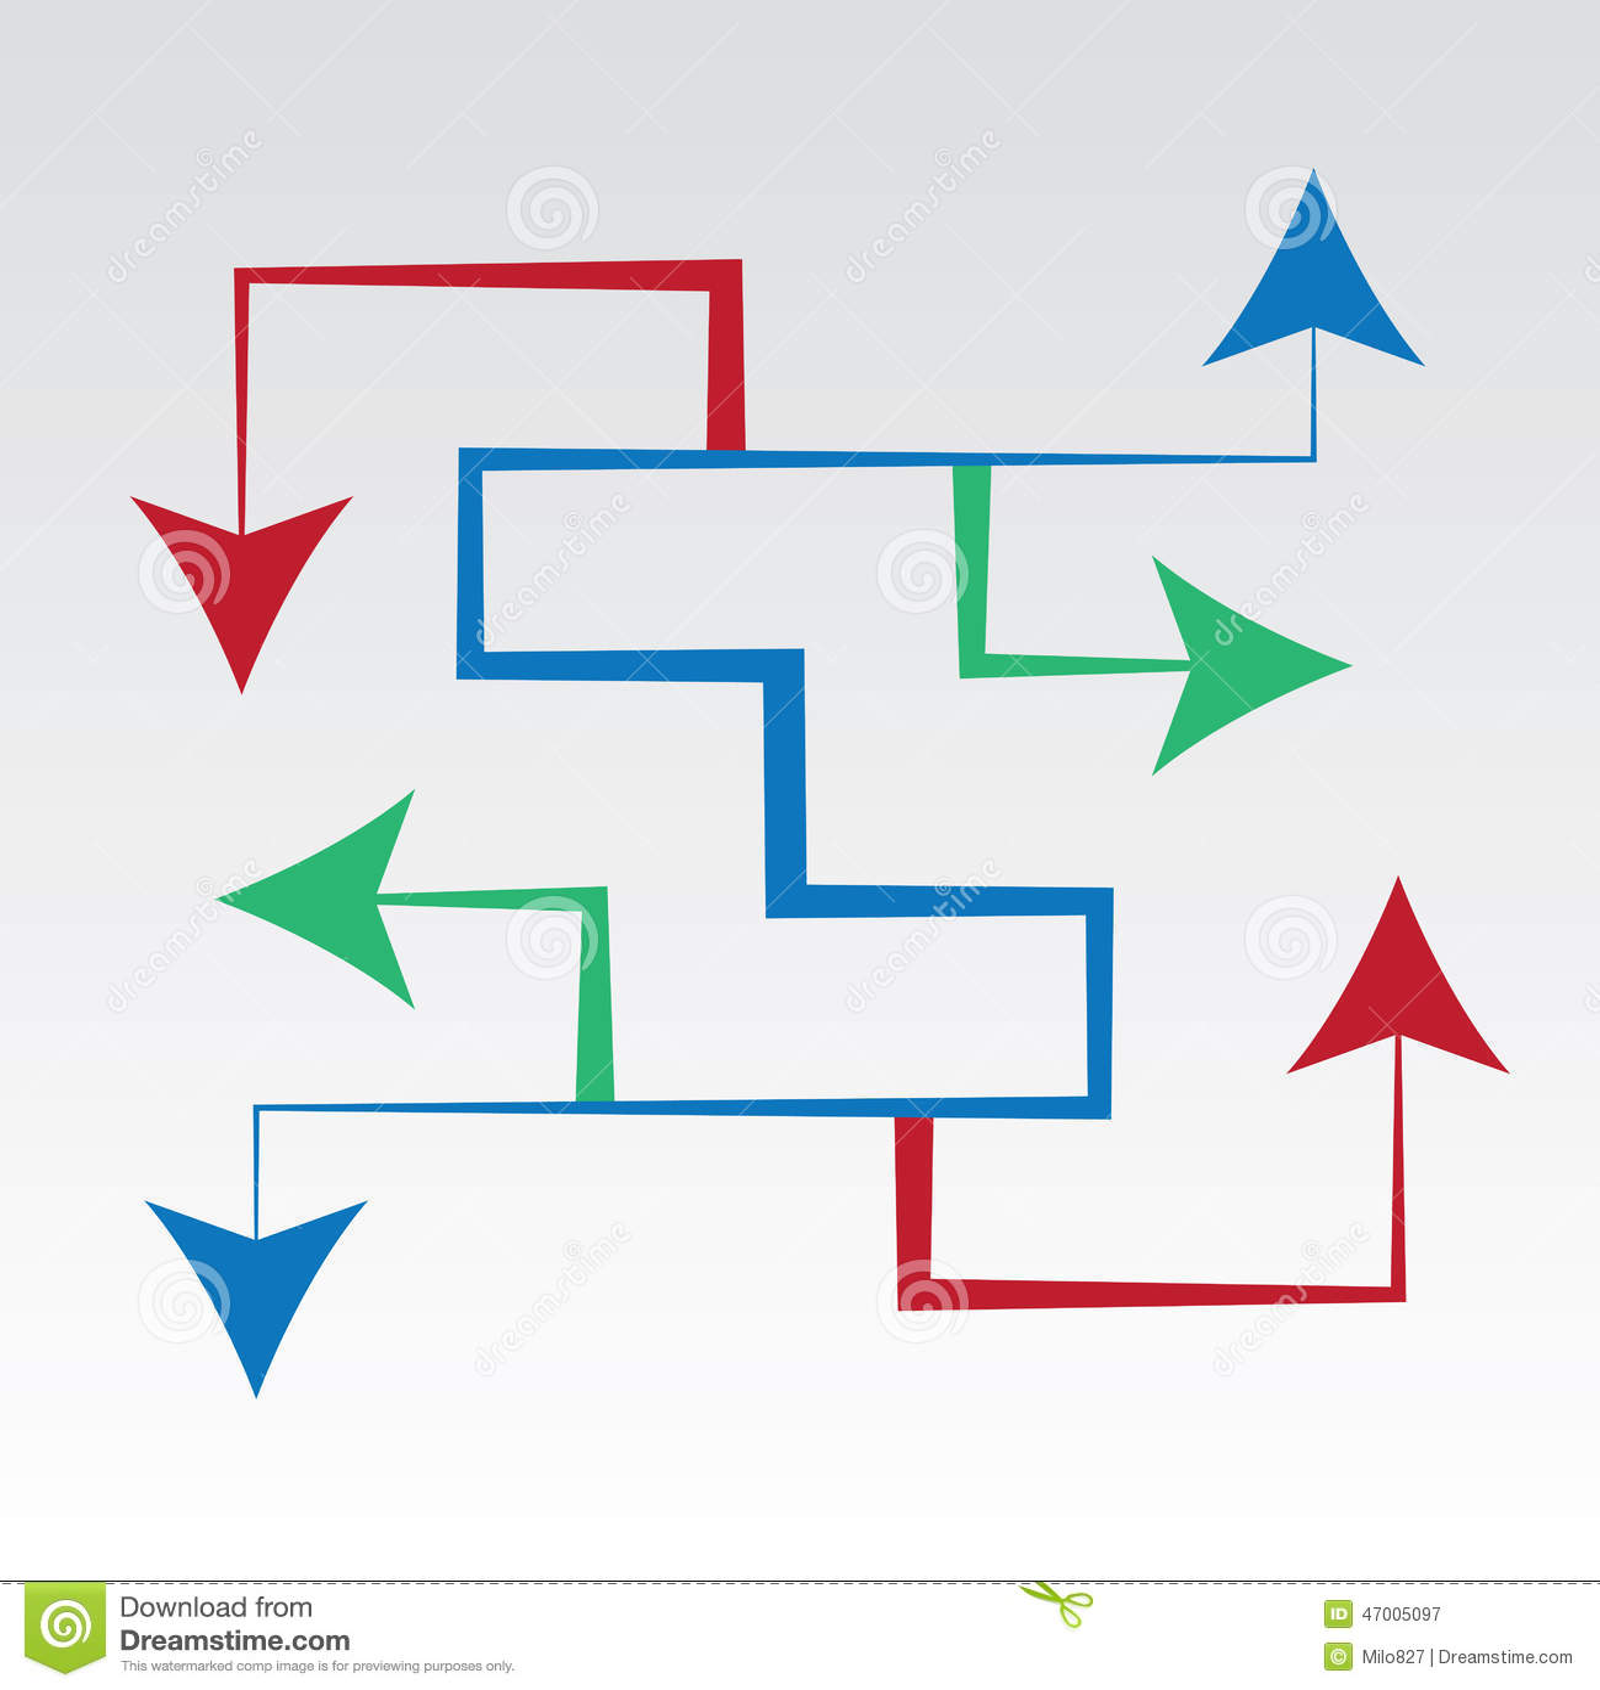 arrows maze all directions illustration 47005097 megapixl